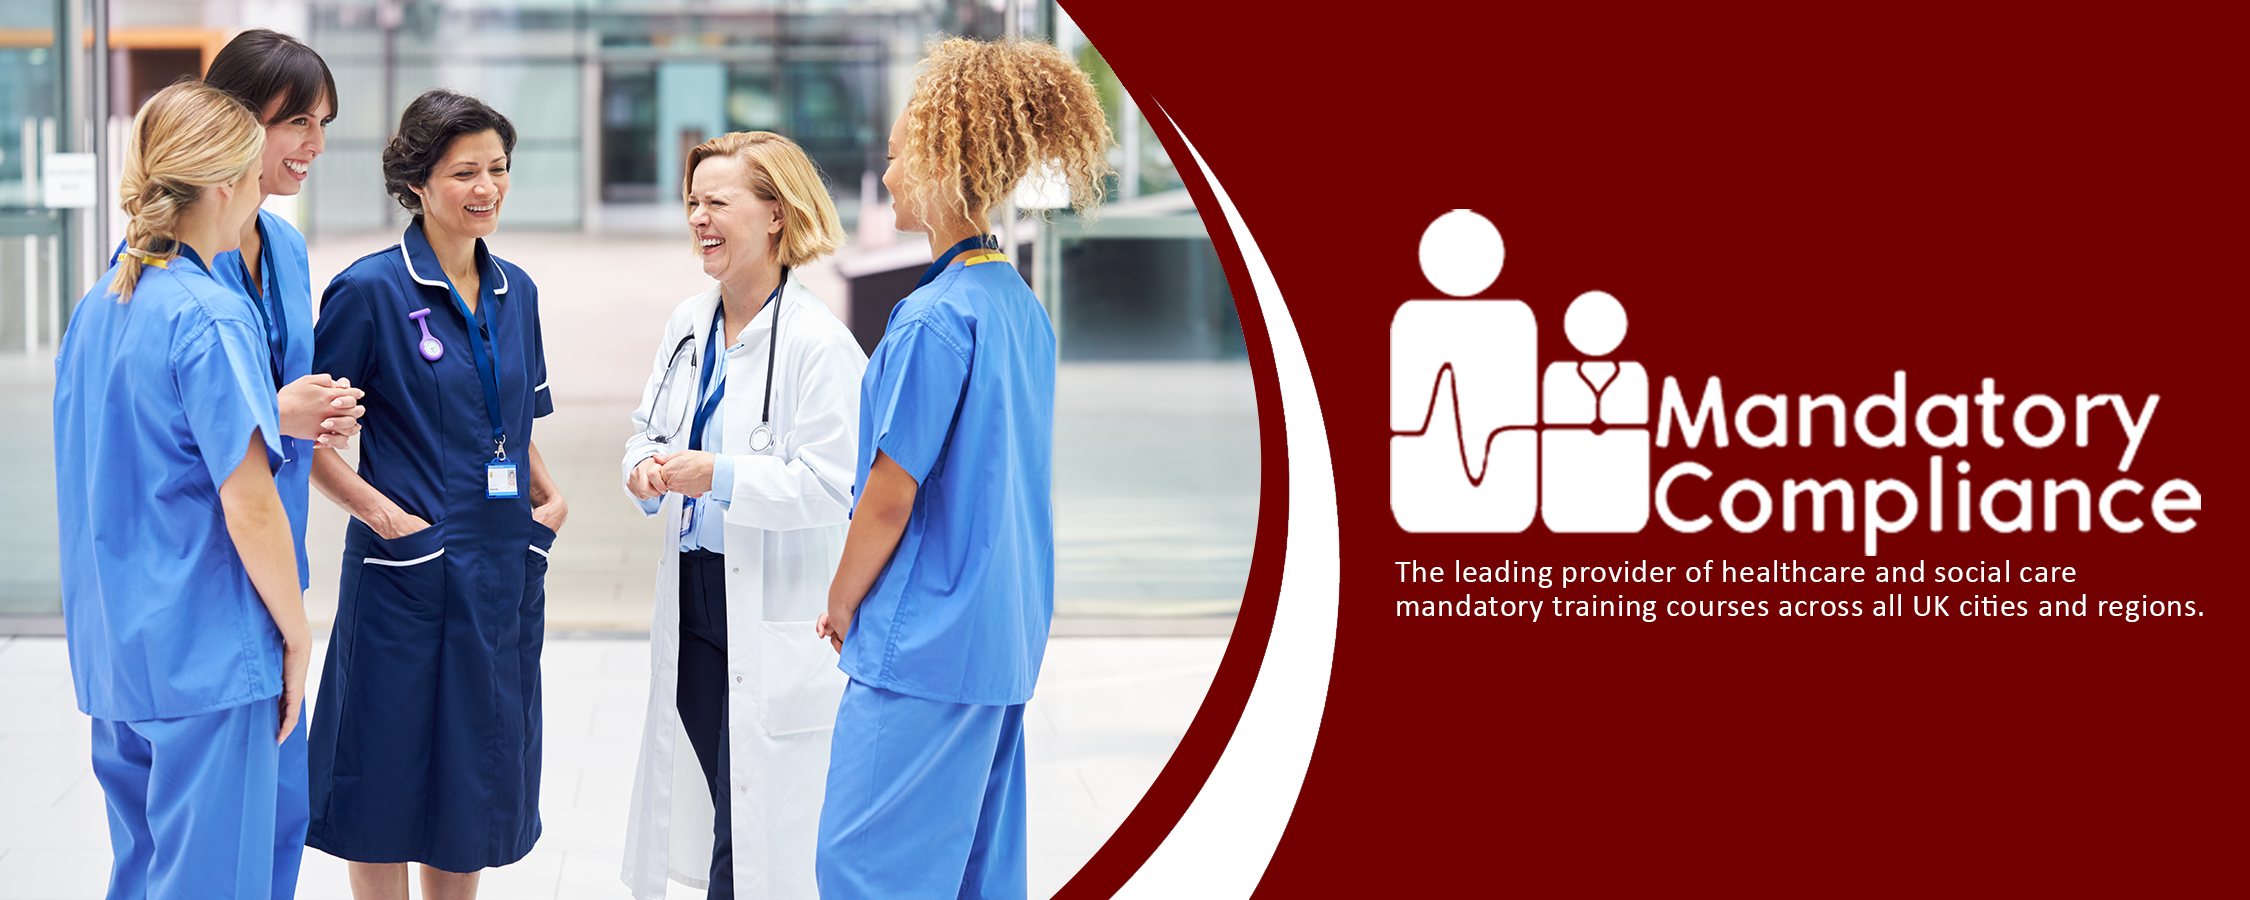 Fluids and Nutrition - E-Learning Courses - Mandatory Compliance UK -